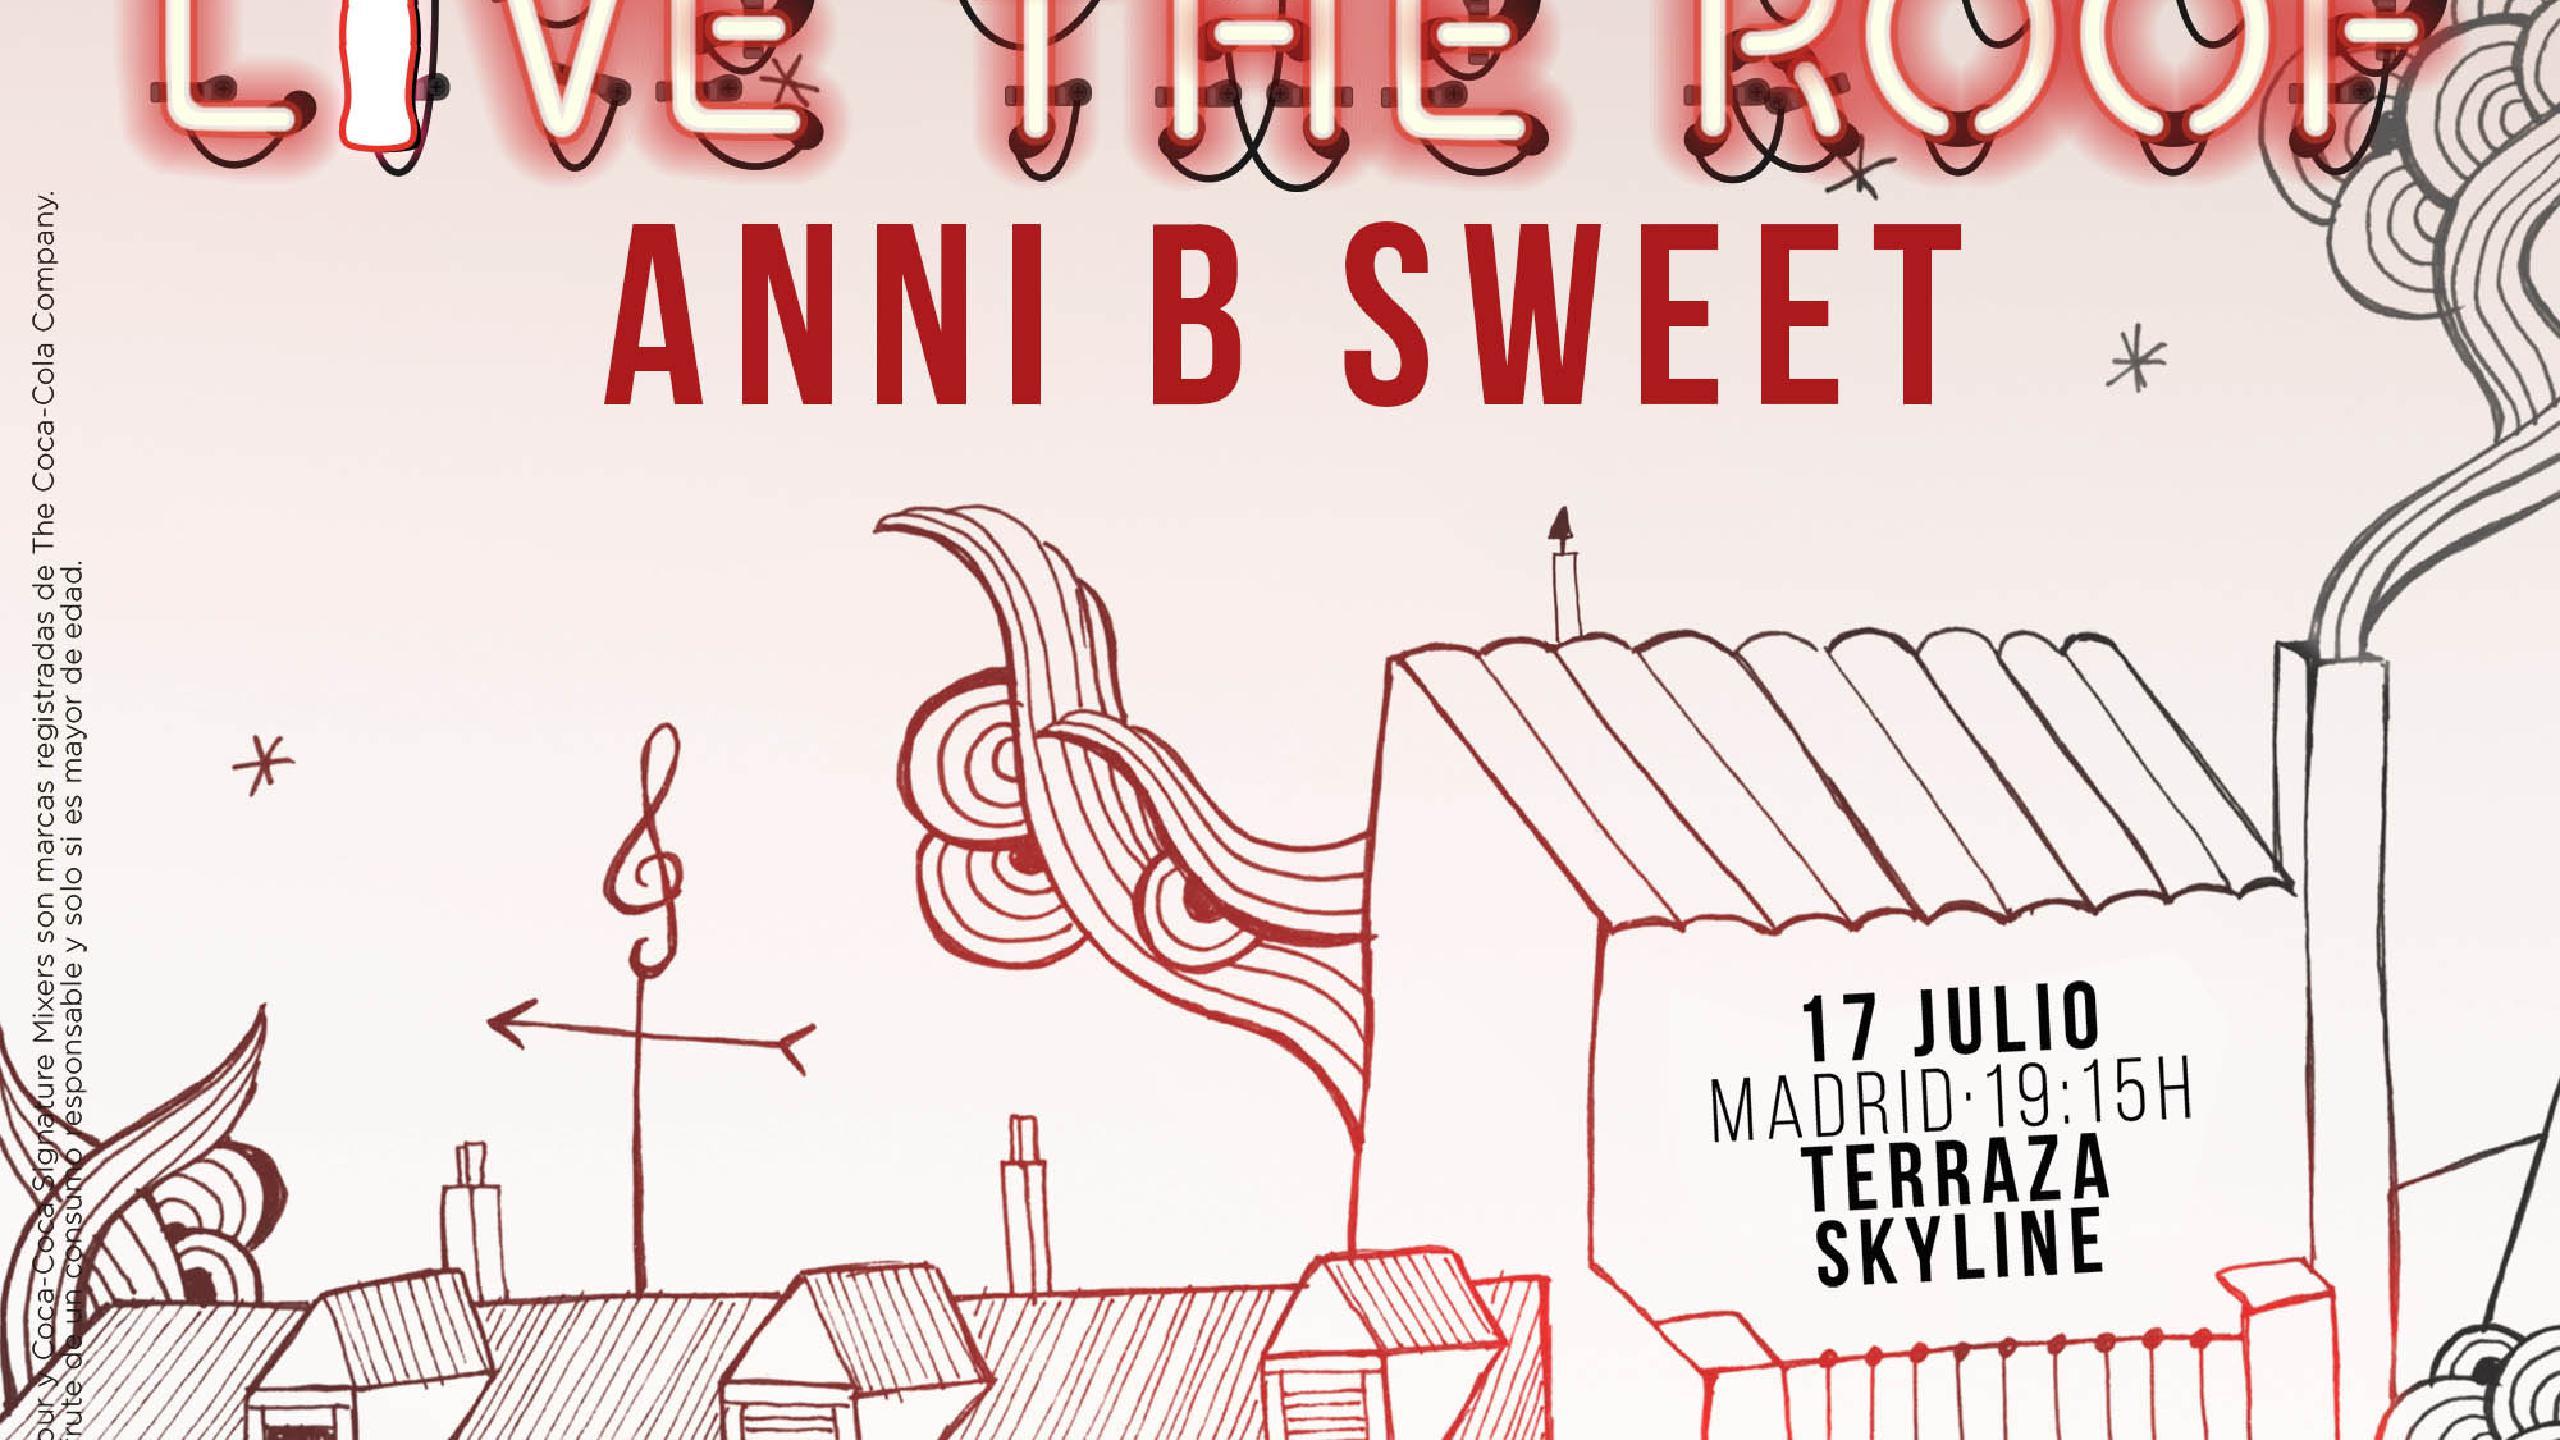 Anni B Sweet Concert Tickets For Terraza Skyline Madrid